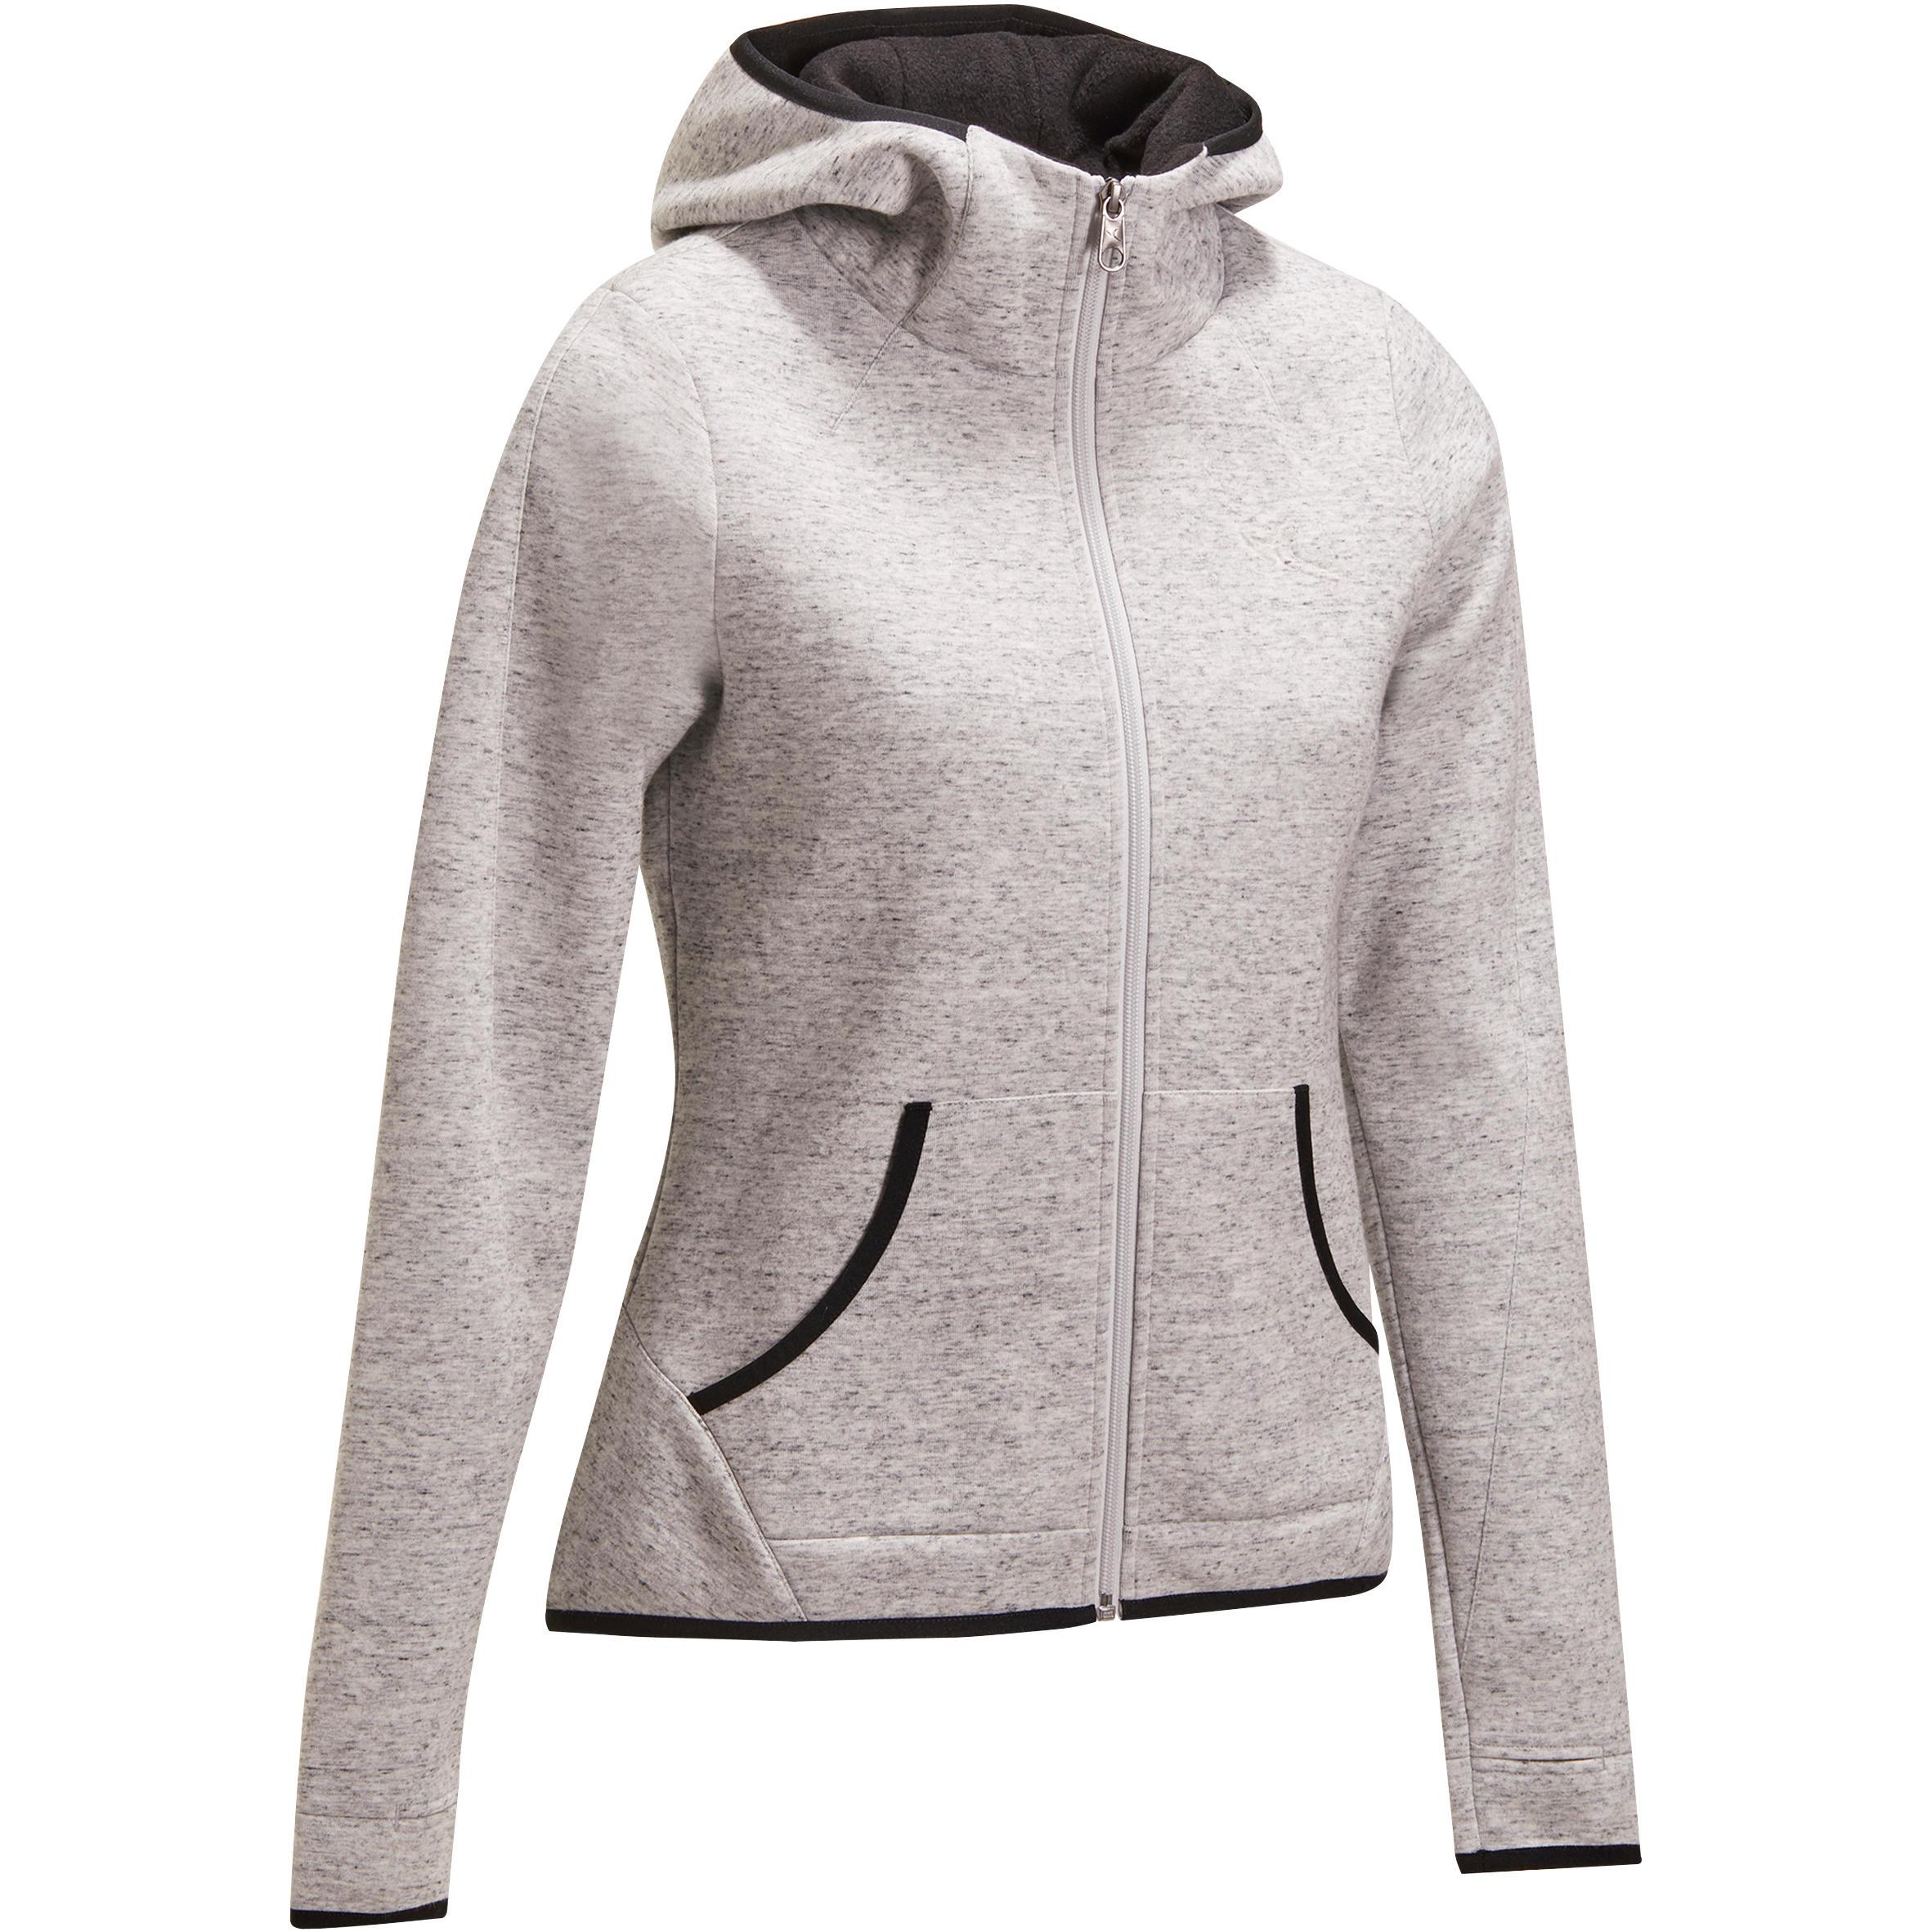 Domyos Fitness hoodie met rits voor dames